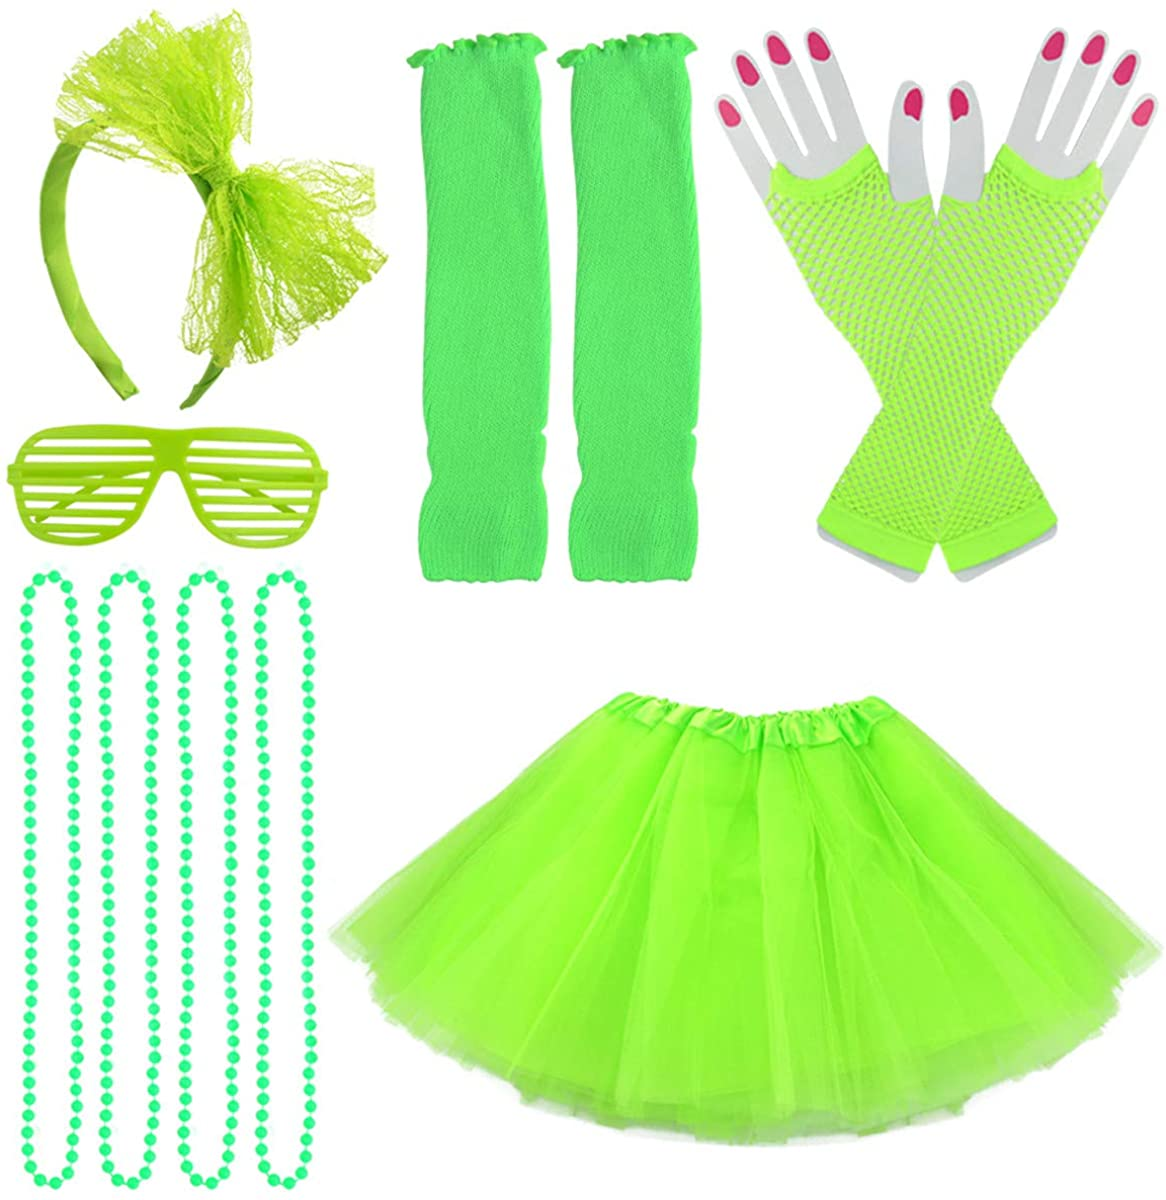 Jerbro 80s Costume Accessories for Girls, 6pcs Skirt Leg Warmers Fishnet Gloves Bracelet Necklace Shutter Glass Rainbow